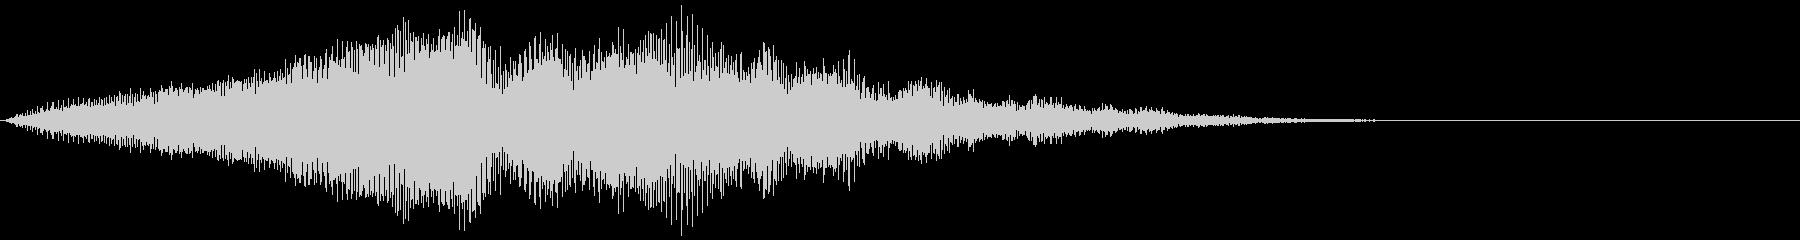 CINEMATIC AMBIENT_03の未再生の波形